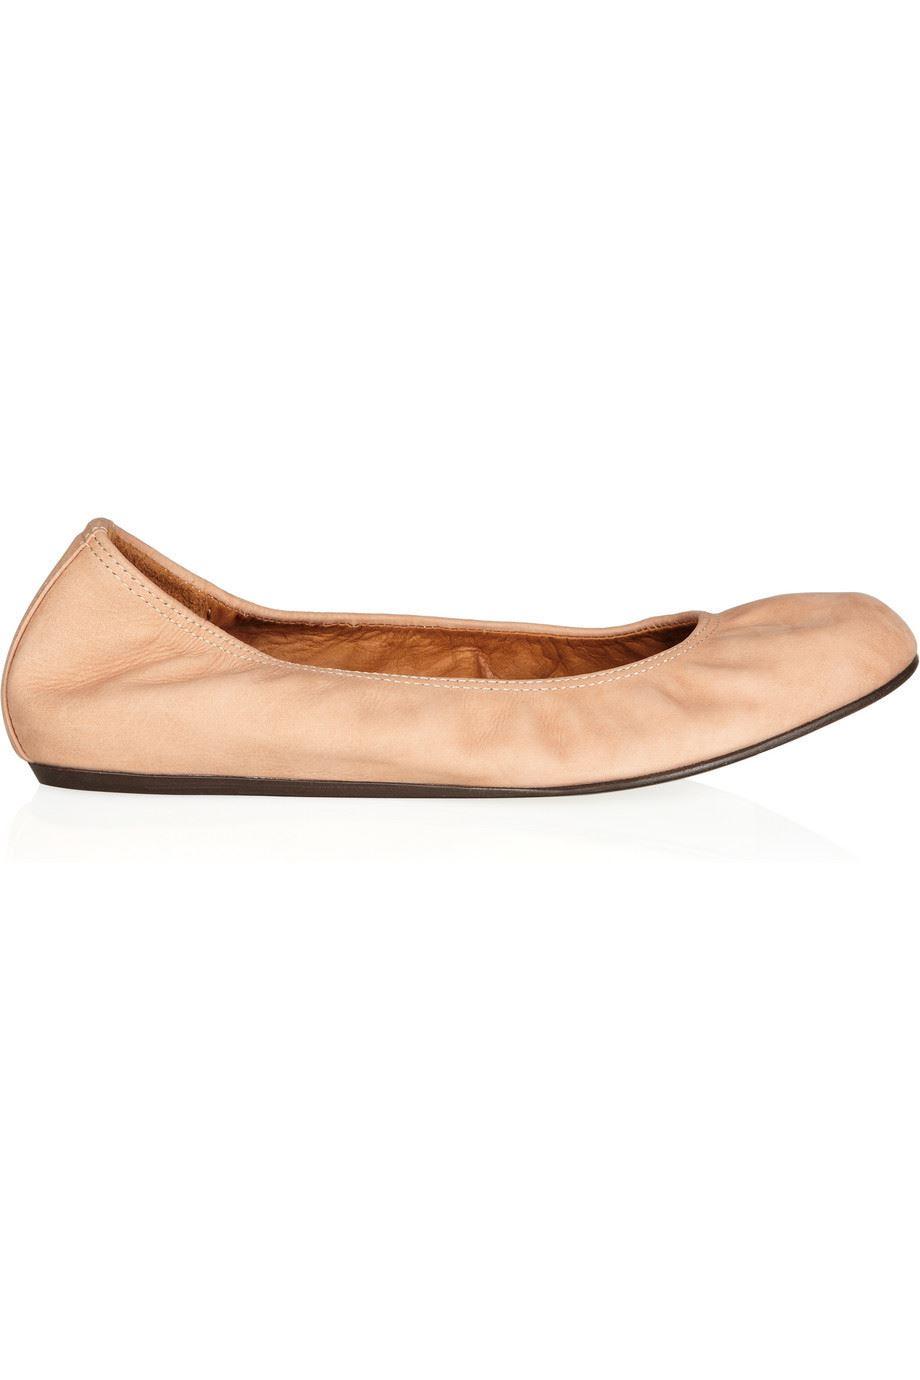 5 10 7 Lanvin Uk Us 40 5 Flats Ballerina Eu 5 Leather w00OqvX